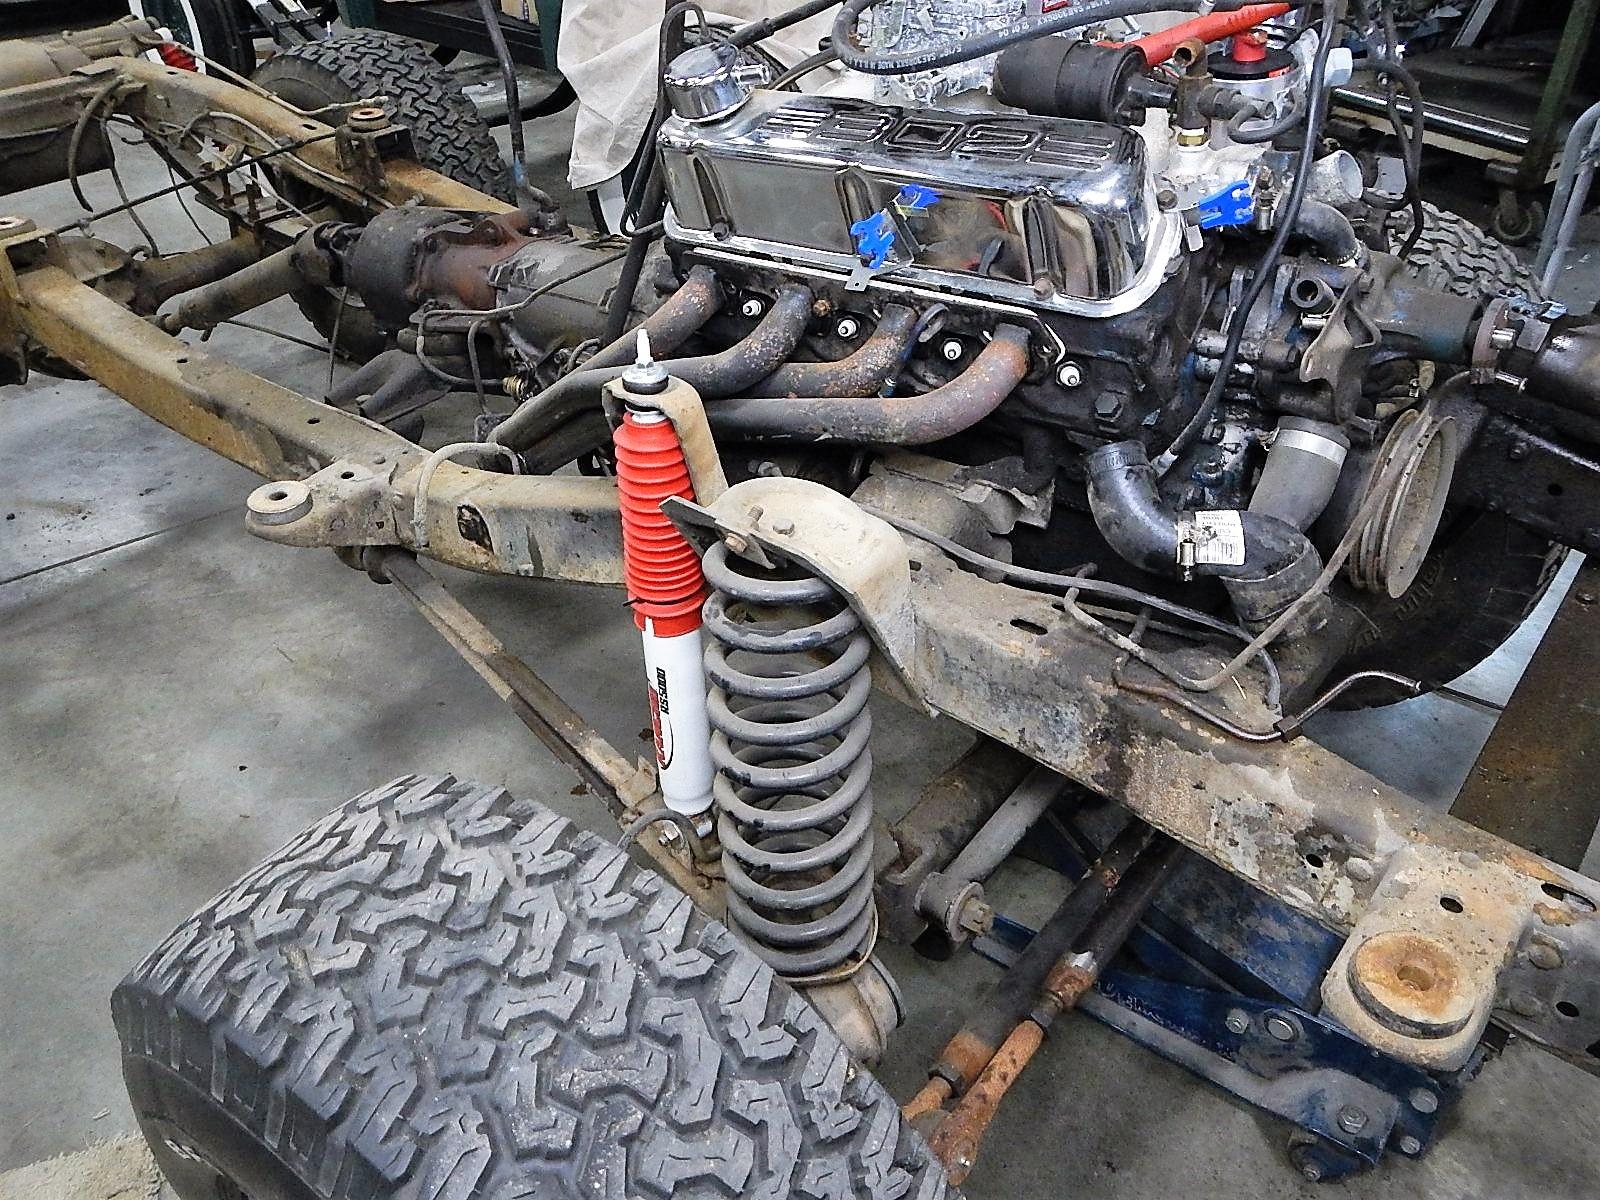 1972 Bronco restoration dis assembly 070.jpg